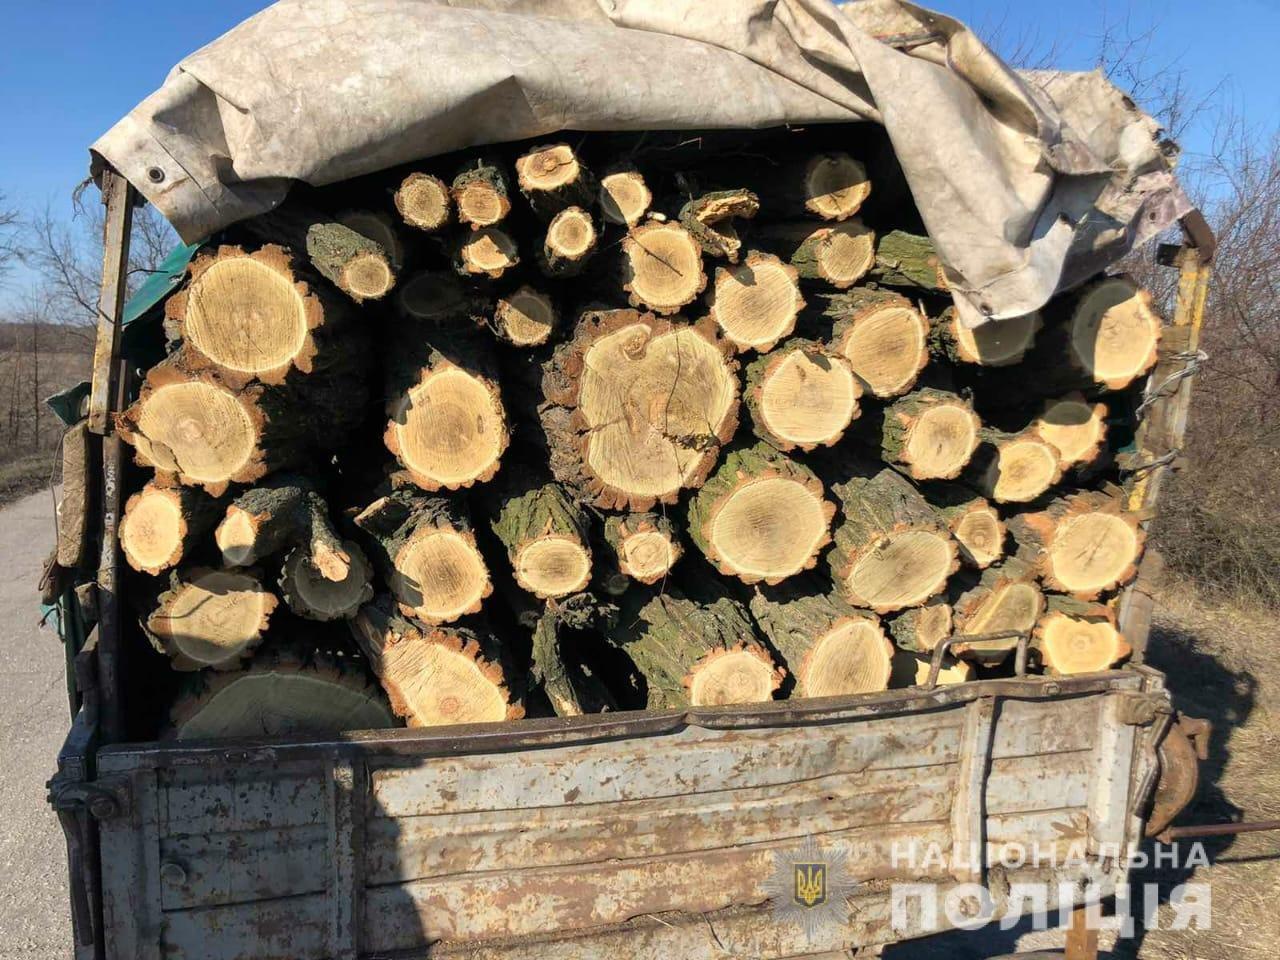 На Днепропетровщине два грузовика незаконно перевозили древесину, - ФОТО, фото-2